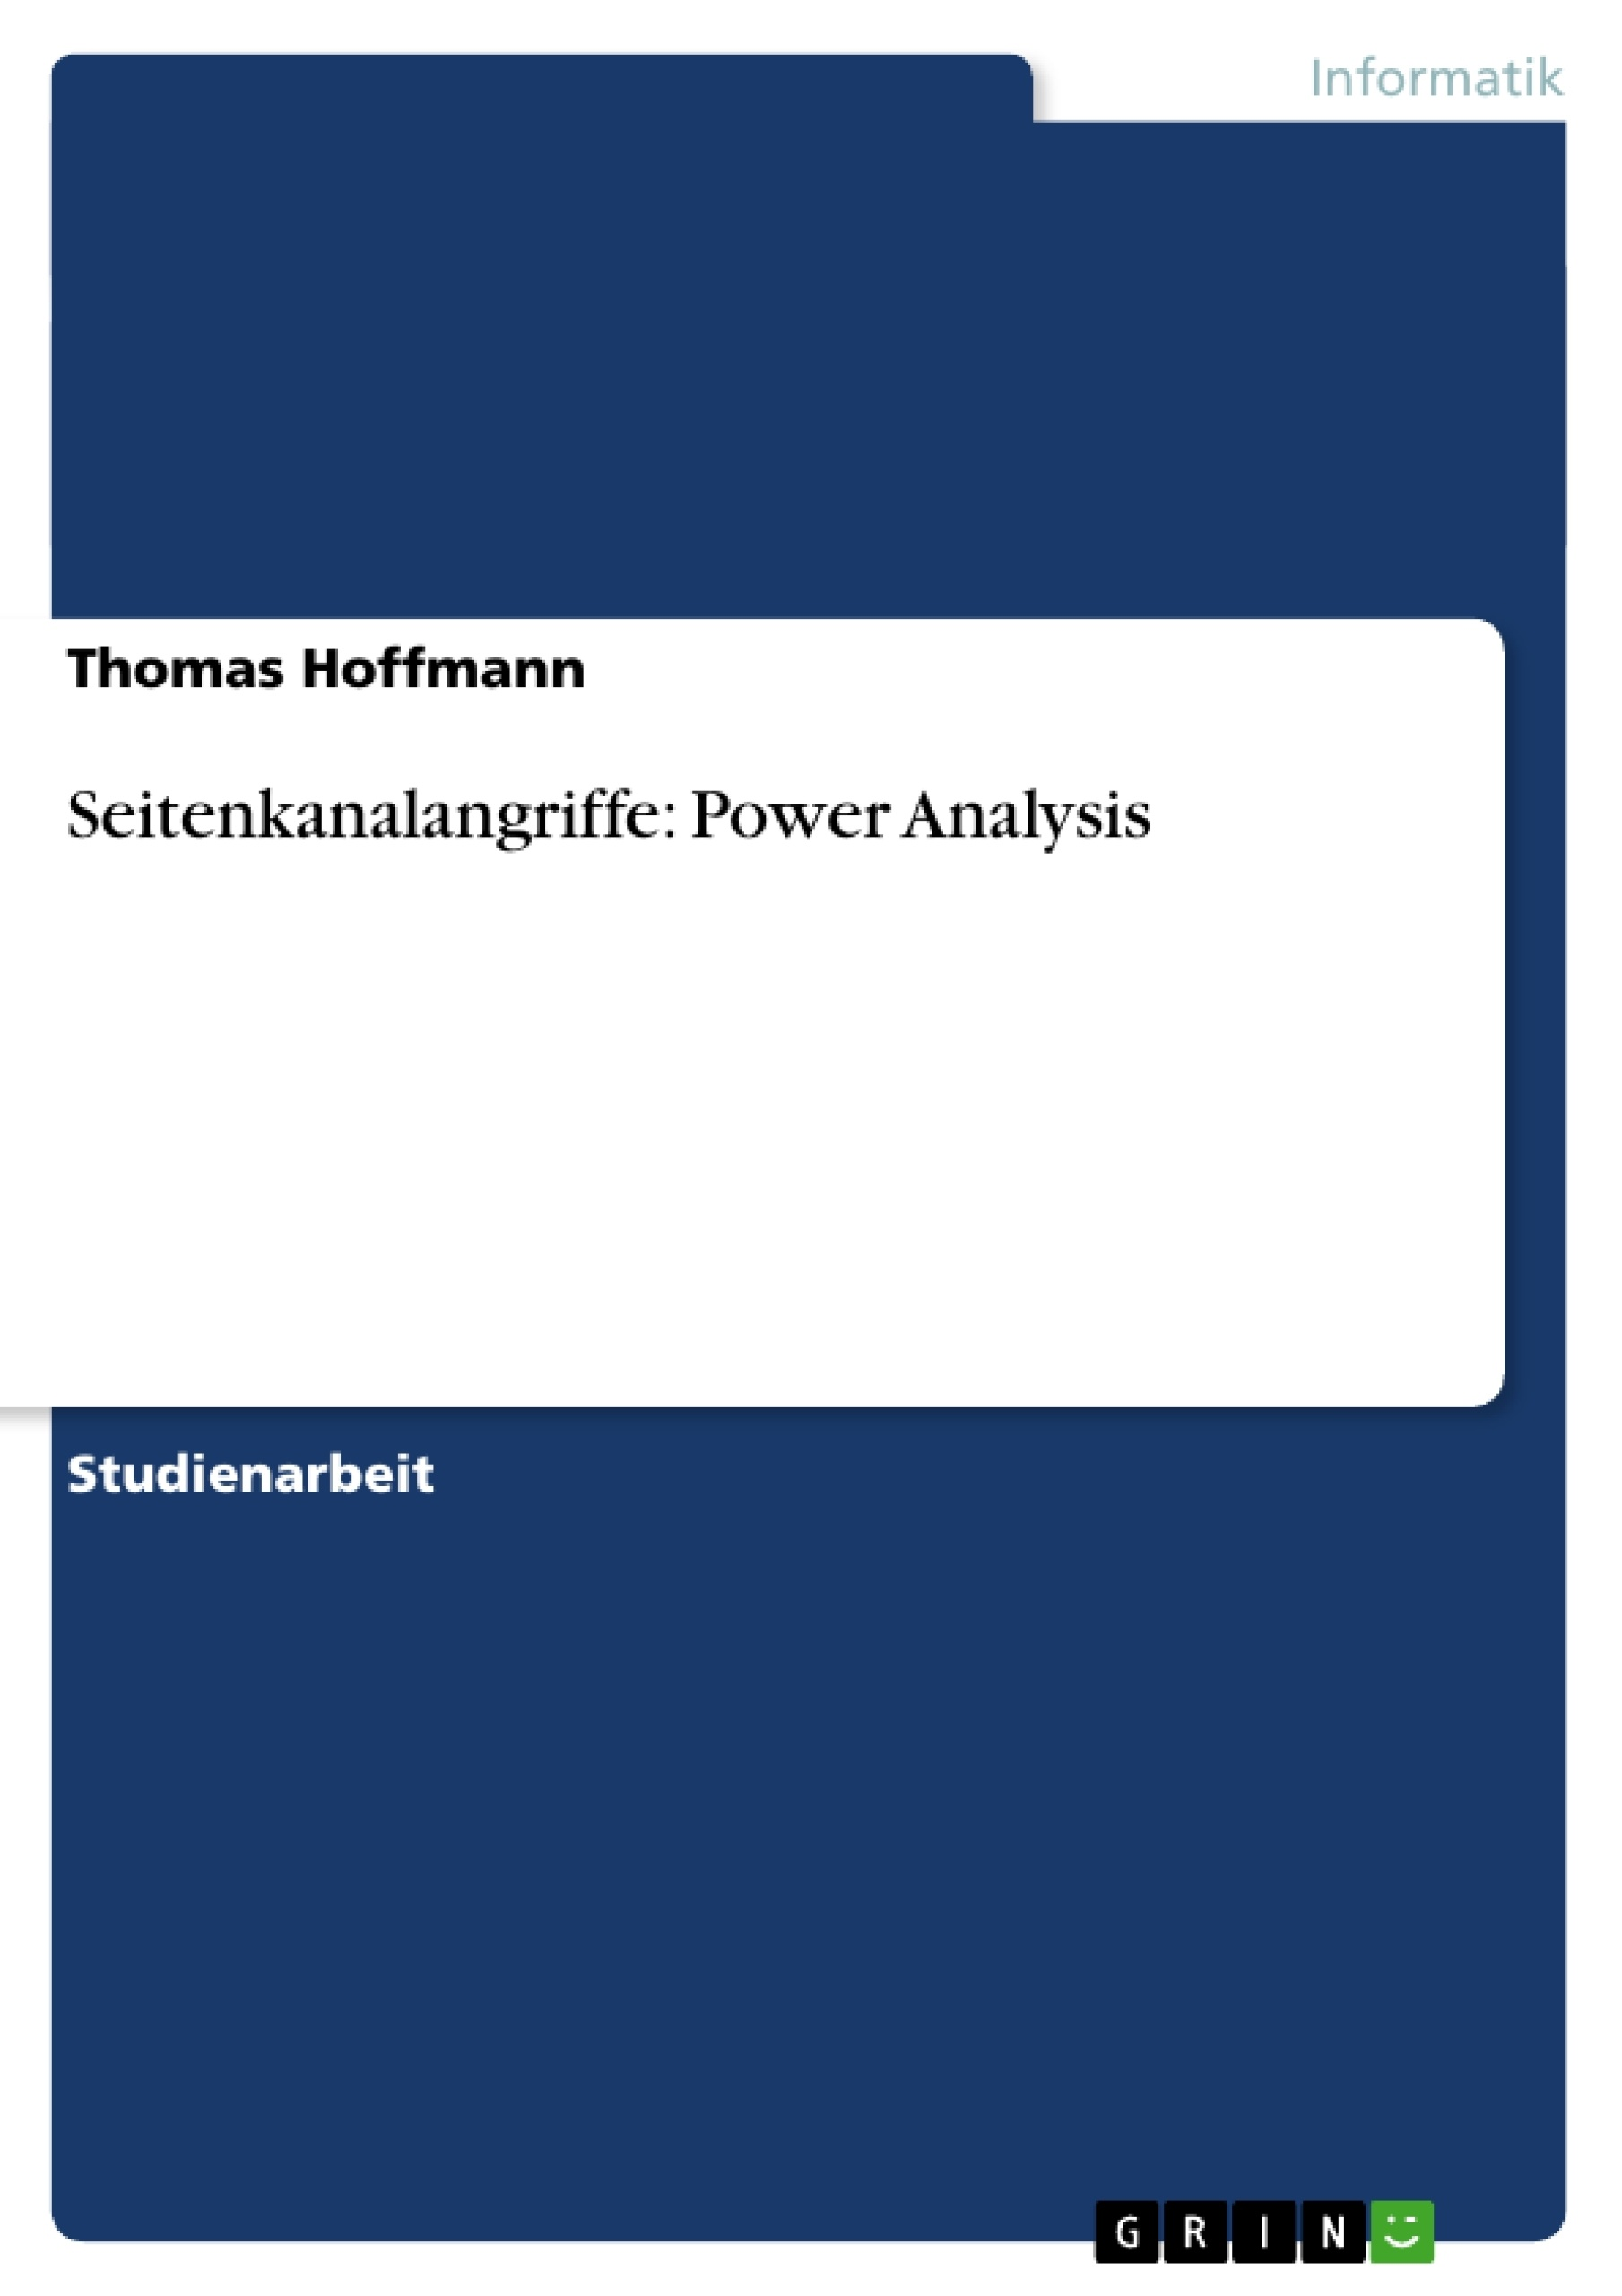 Titel: Seitenkanalangriffe: Power Analysis